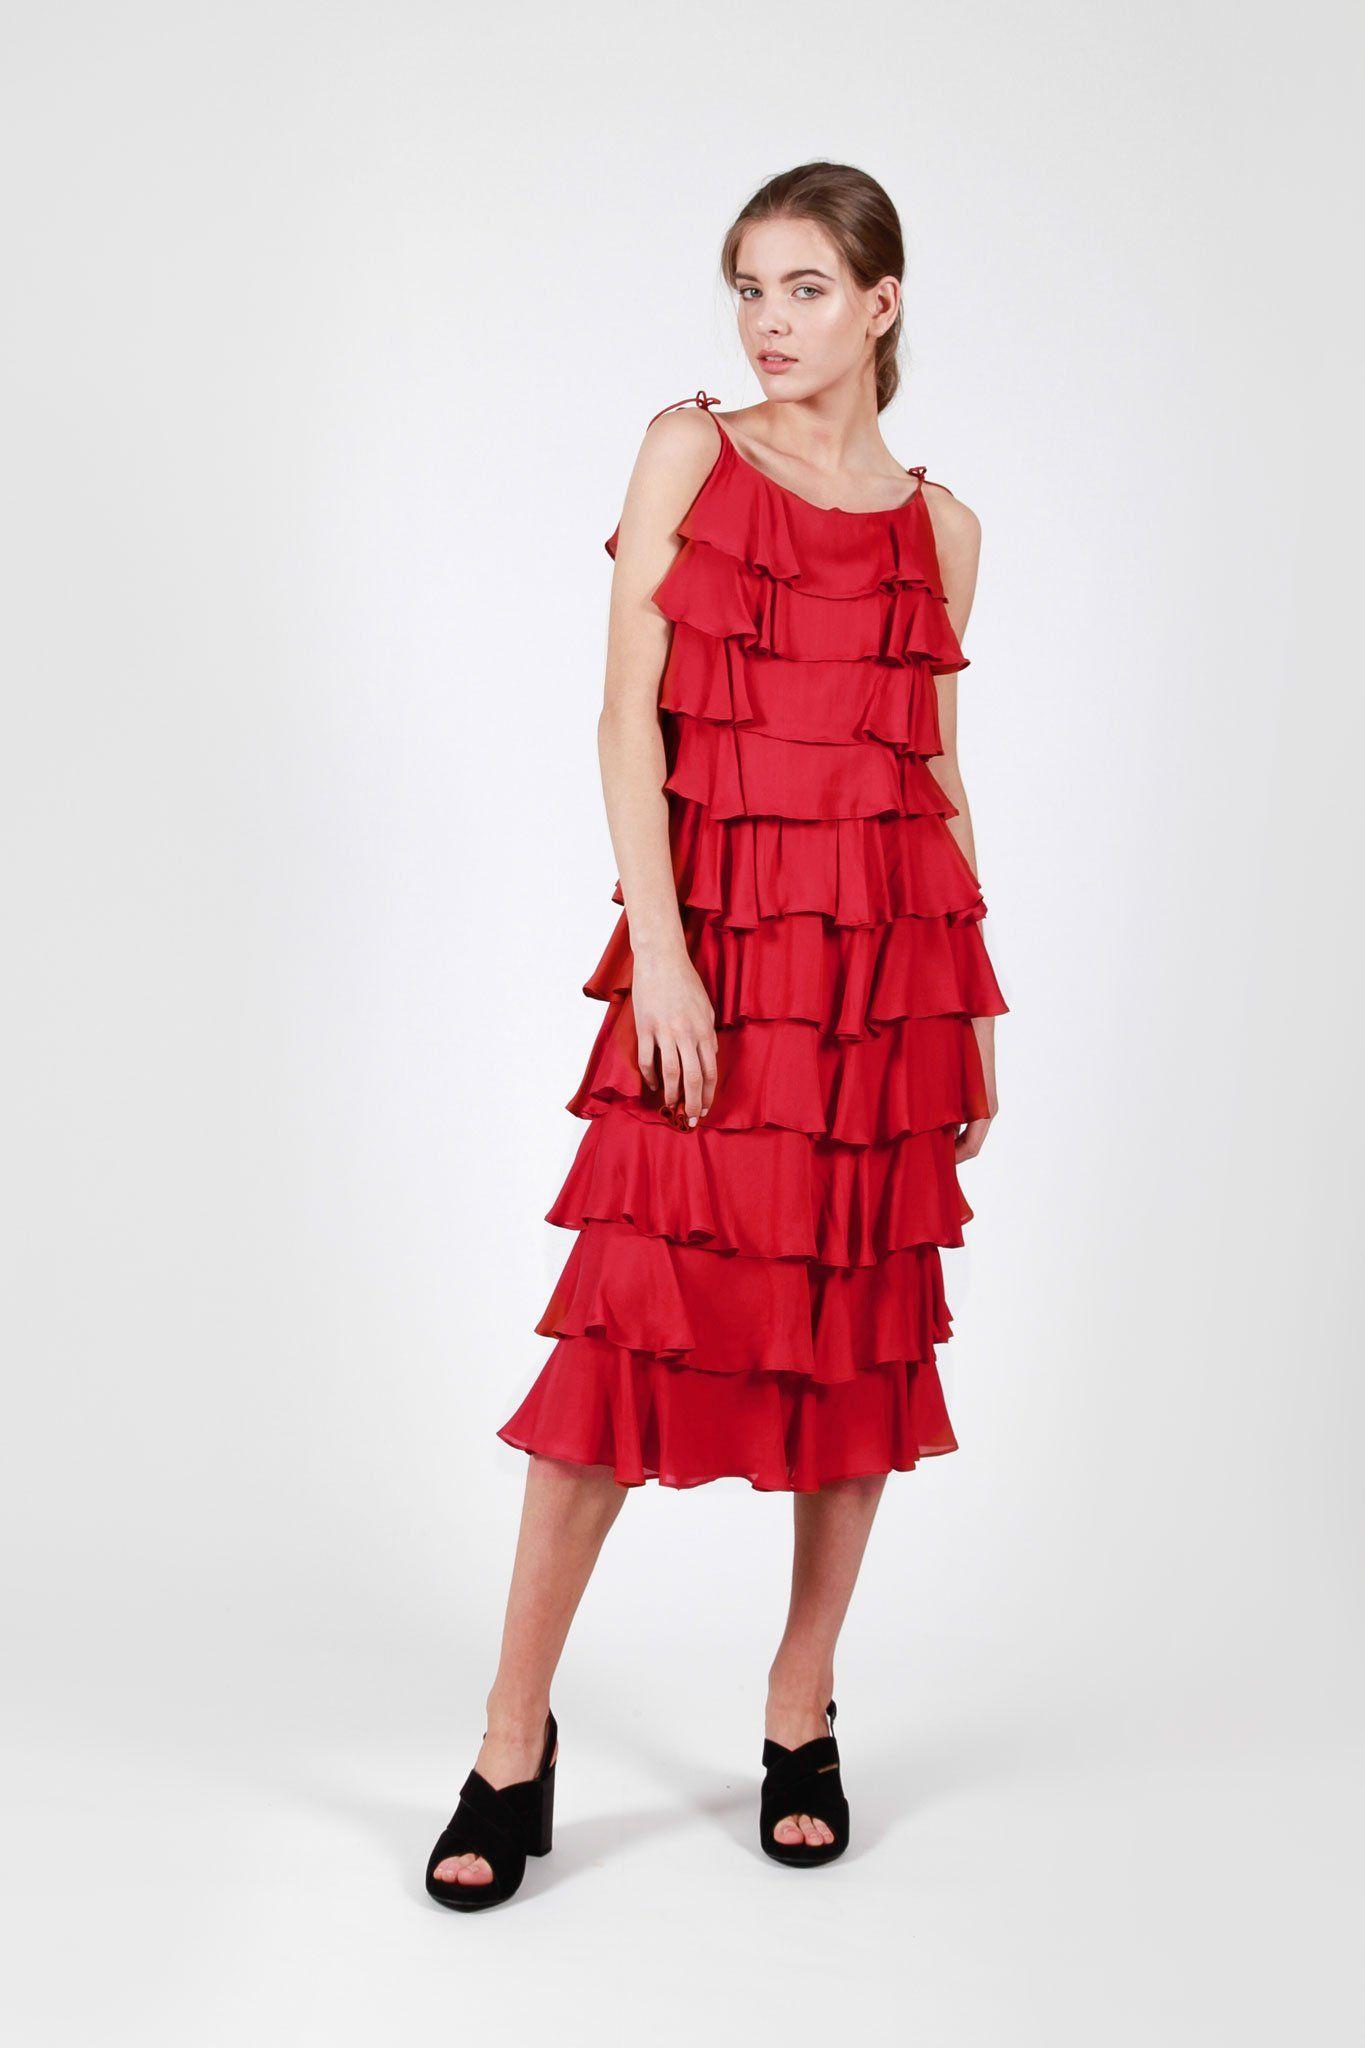 331c931010 salir dress red – búl